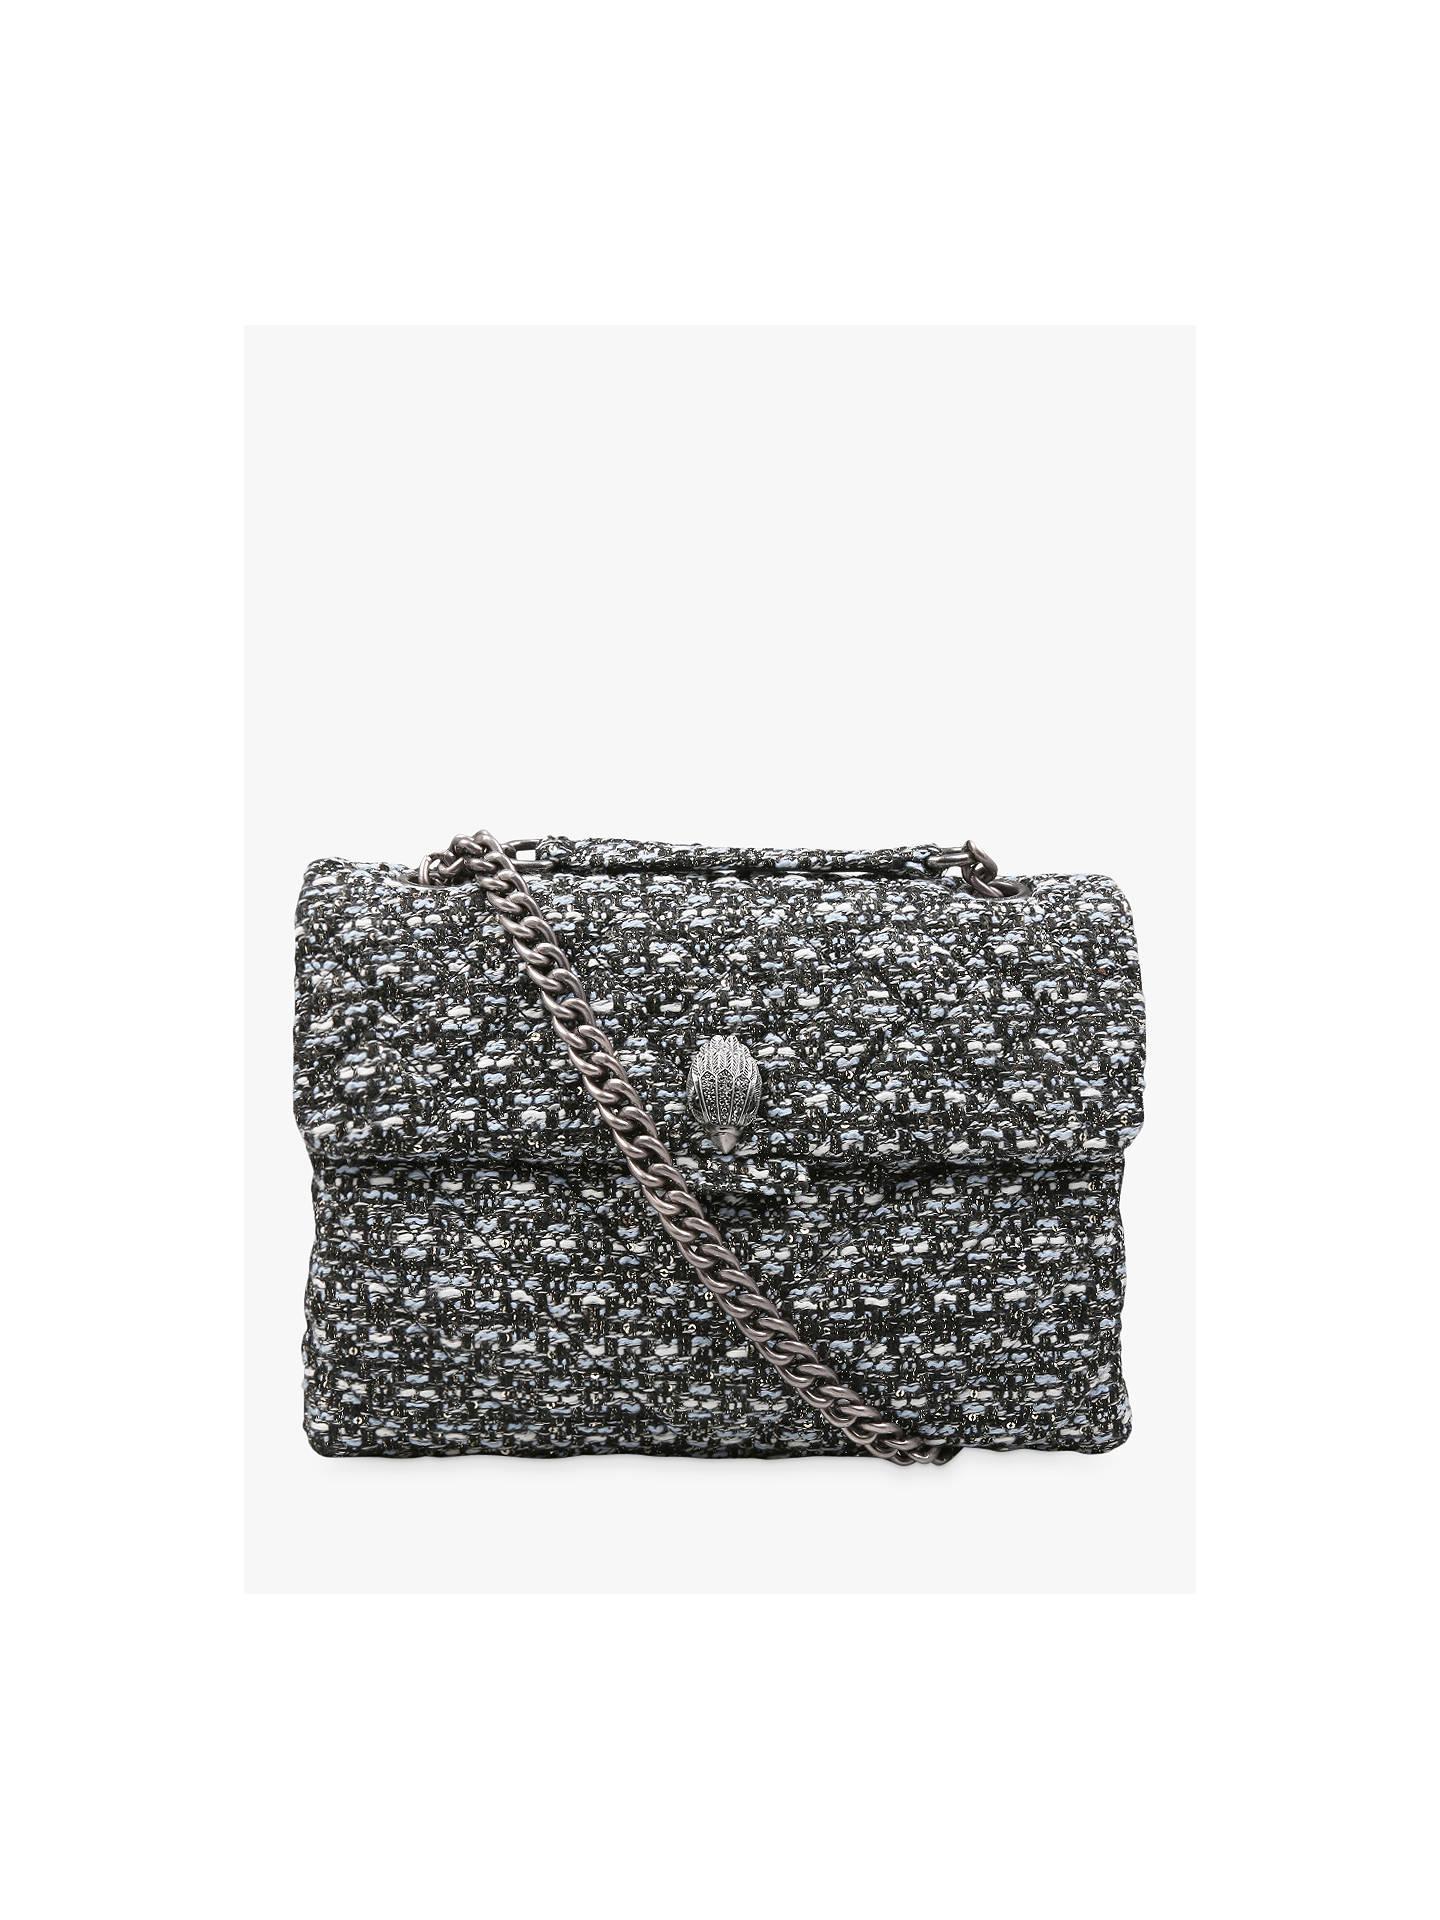 1568ded9365 Buy Kurt Geiger London Tweed Kensington Shoulder Bag, Blue/Multi Online at  johnlewis.